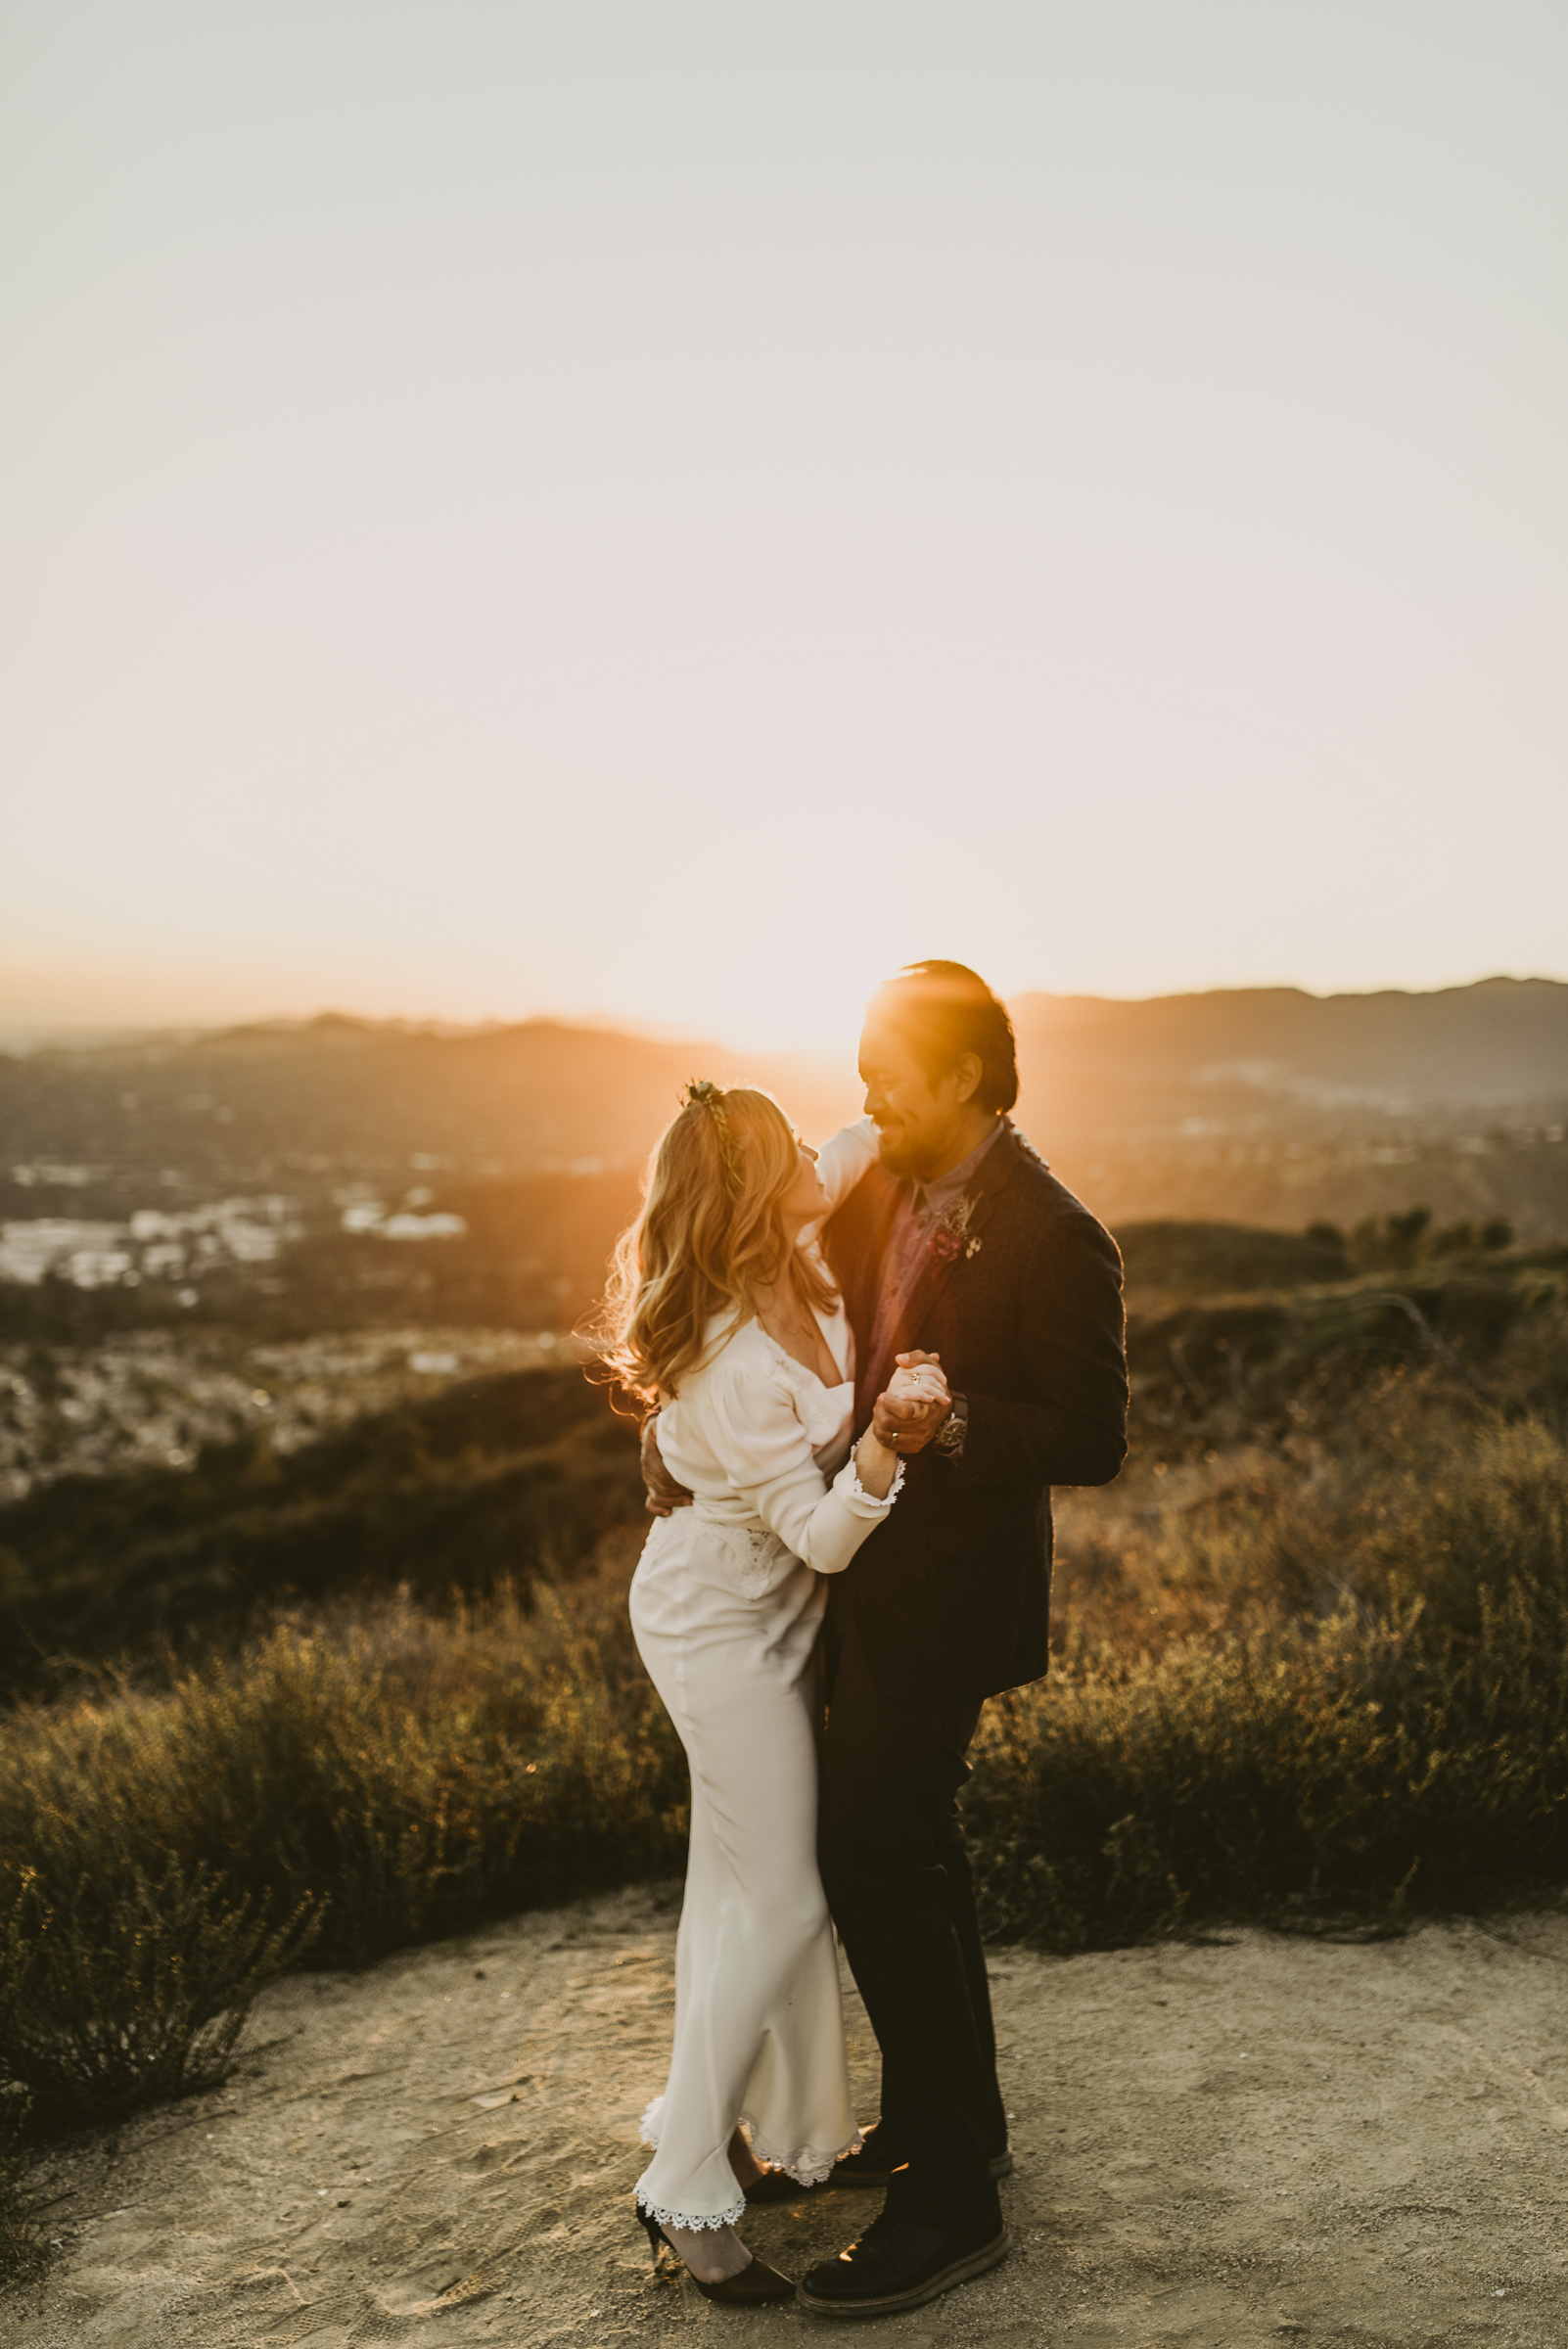 ©Isaiah + Taylor Photography - Intimate Elopement, Eaton Canyon, Los Angeles Wedding Photographer-99.jpg